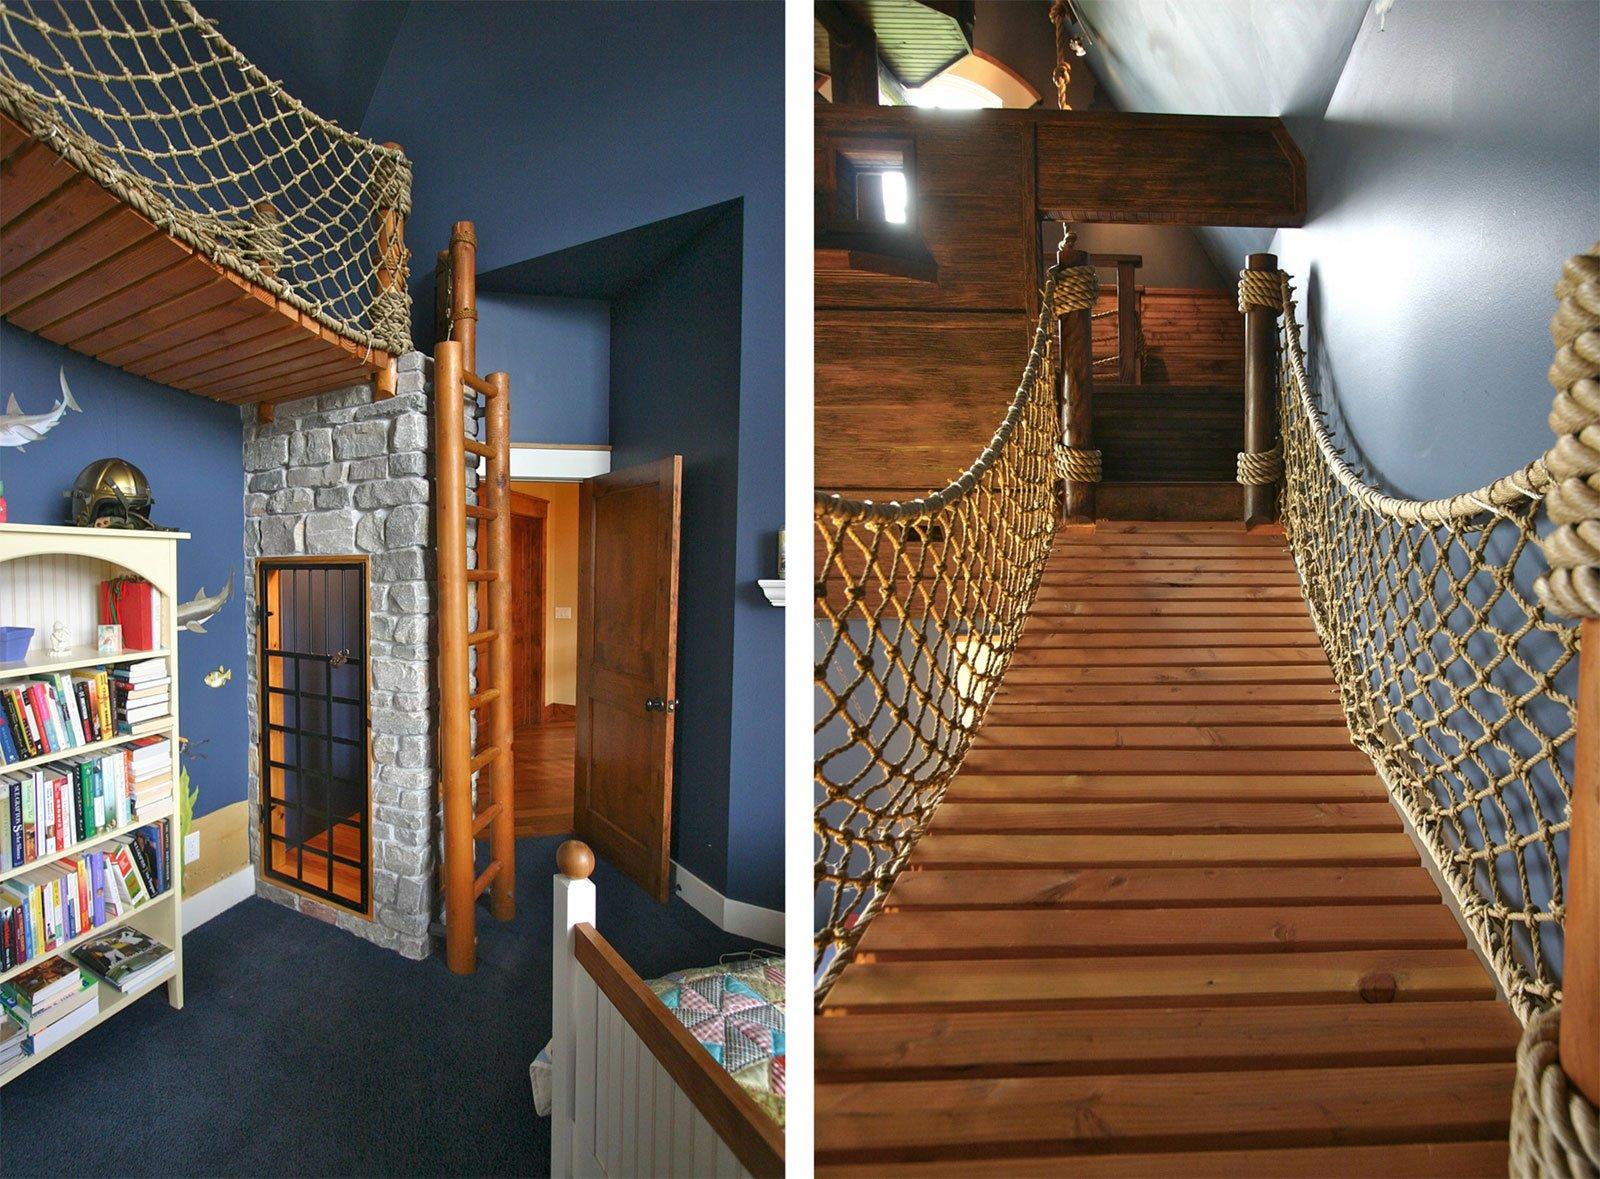 Habitaci n infantil con decoraci n pirata decoraci n del for Decoracion barcos interiores